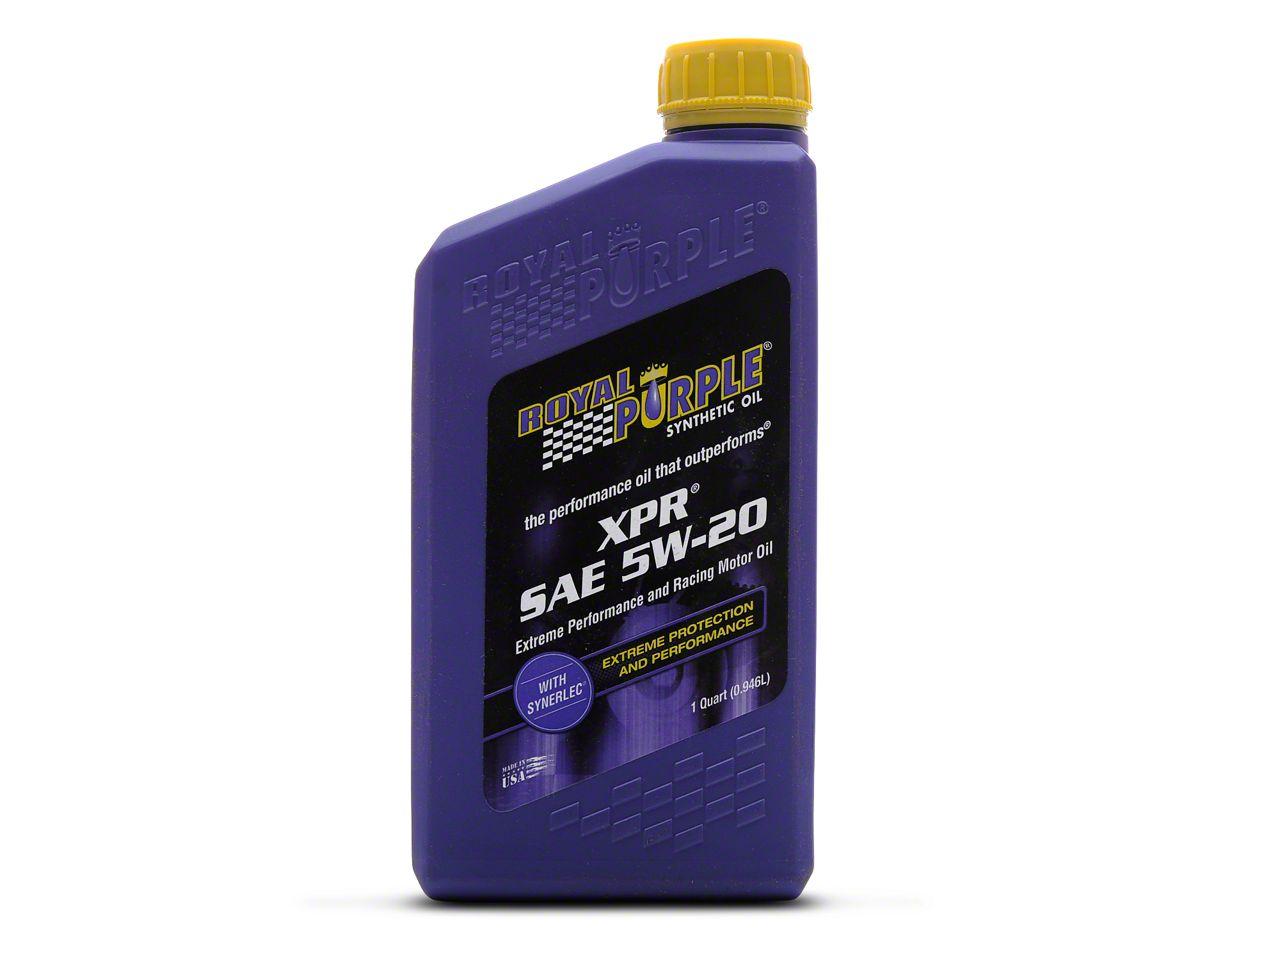 Royal Purple XPR Race 5w20 Motor Oil